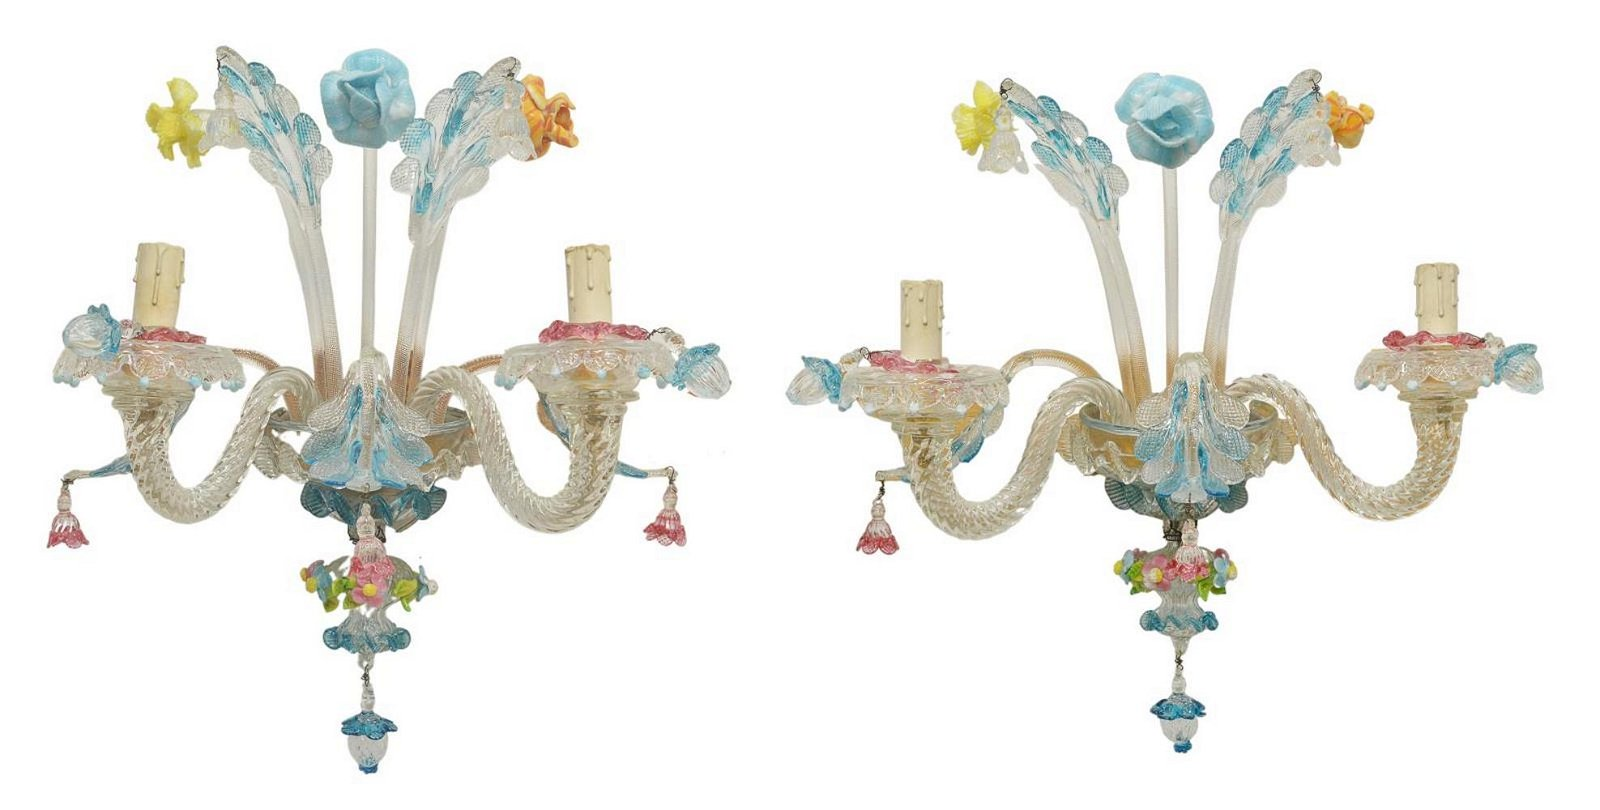 (2) ITALIAN MURANO GLASS REZZONICO WALL SCONCES